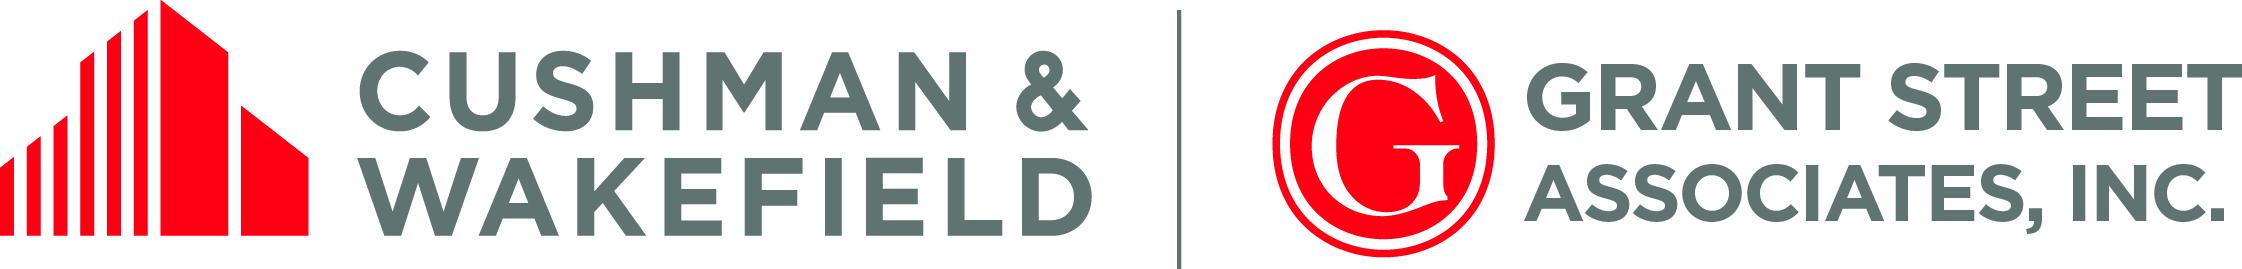 Grant Street Associates Alliance Logo